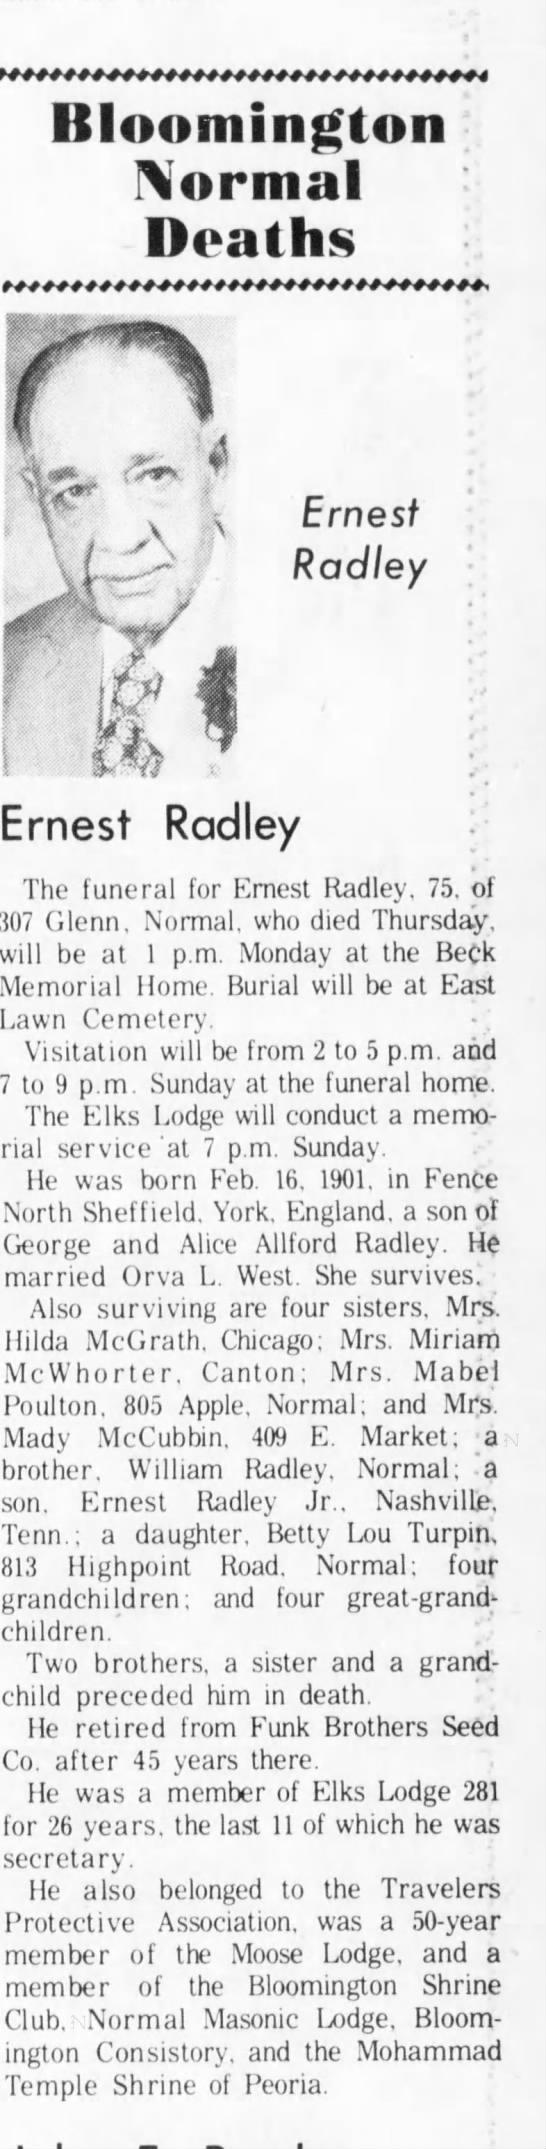 Earnest Radley obit 5 Jun 1976 - 4 Bloomington Normal Deaths t f I 1 f Ernest...